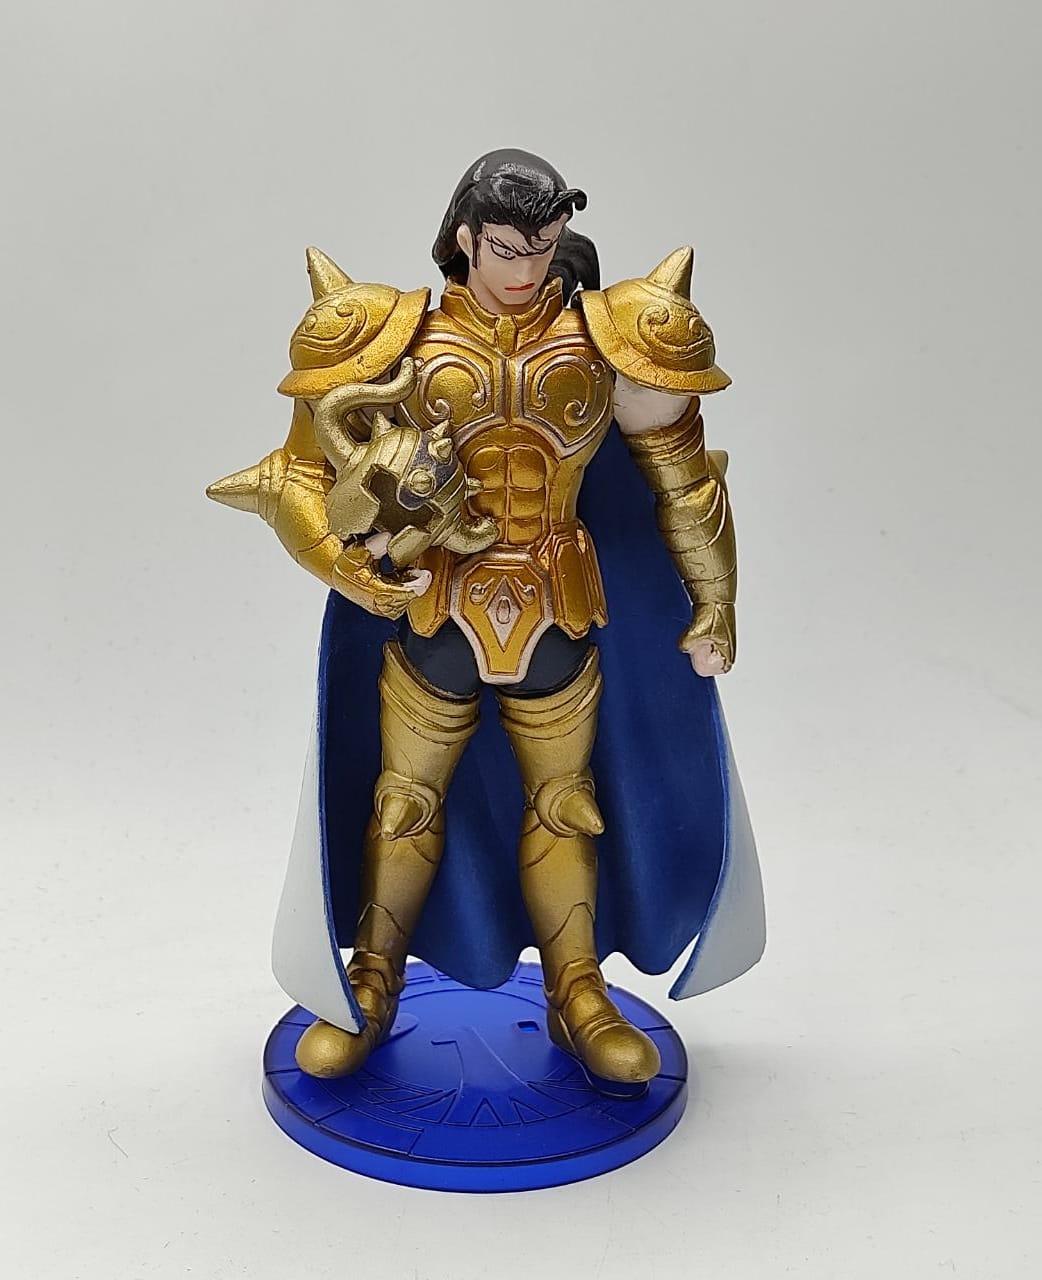 Estátua Aldebaran Armadura de Ouro de Touro: Cavaleiros do Zodíaco